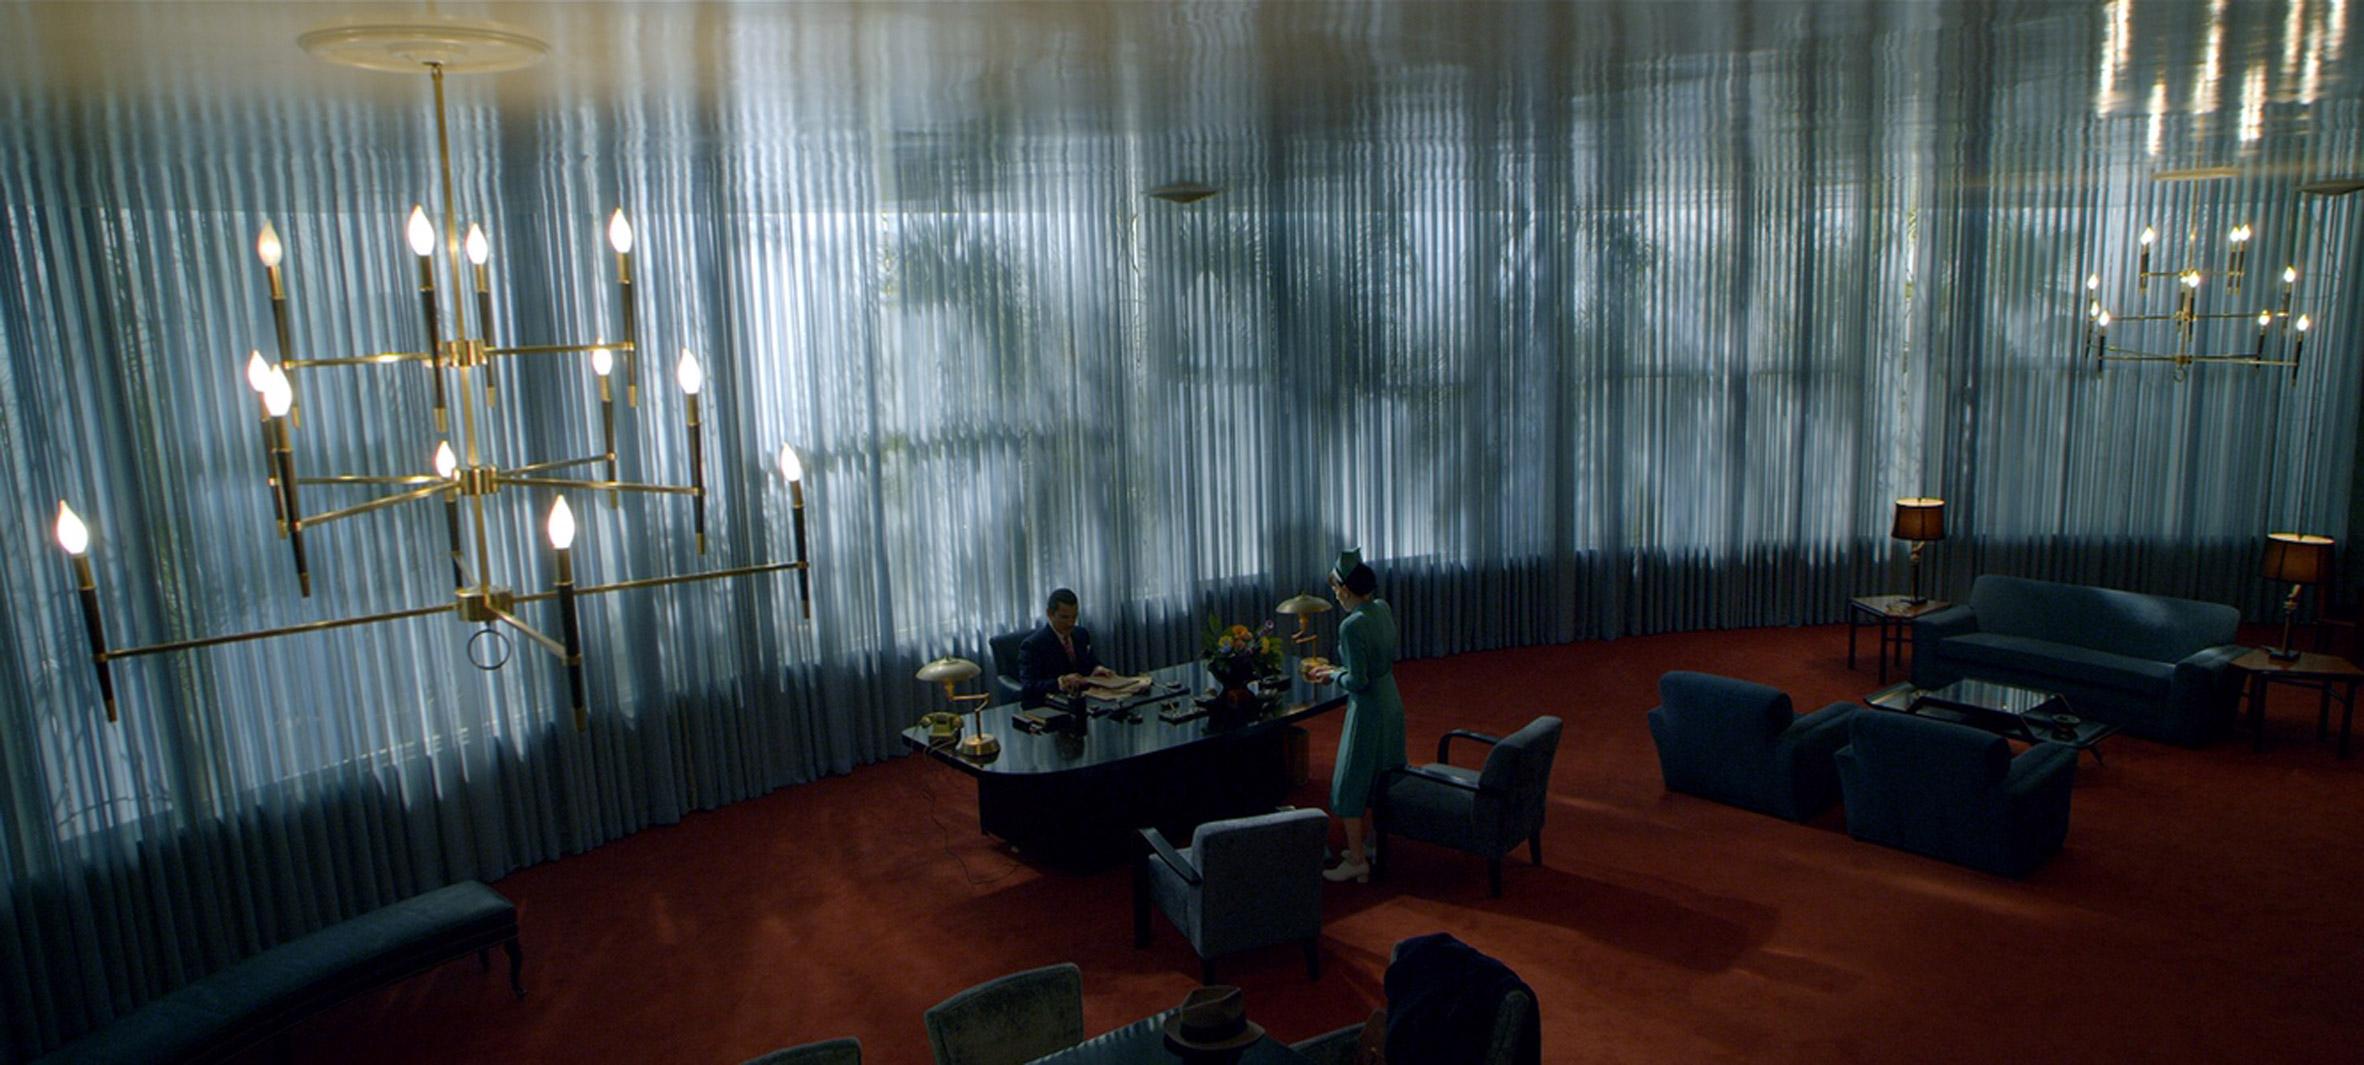 Dr Hanover's office